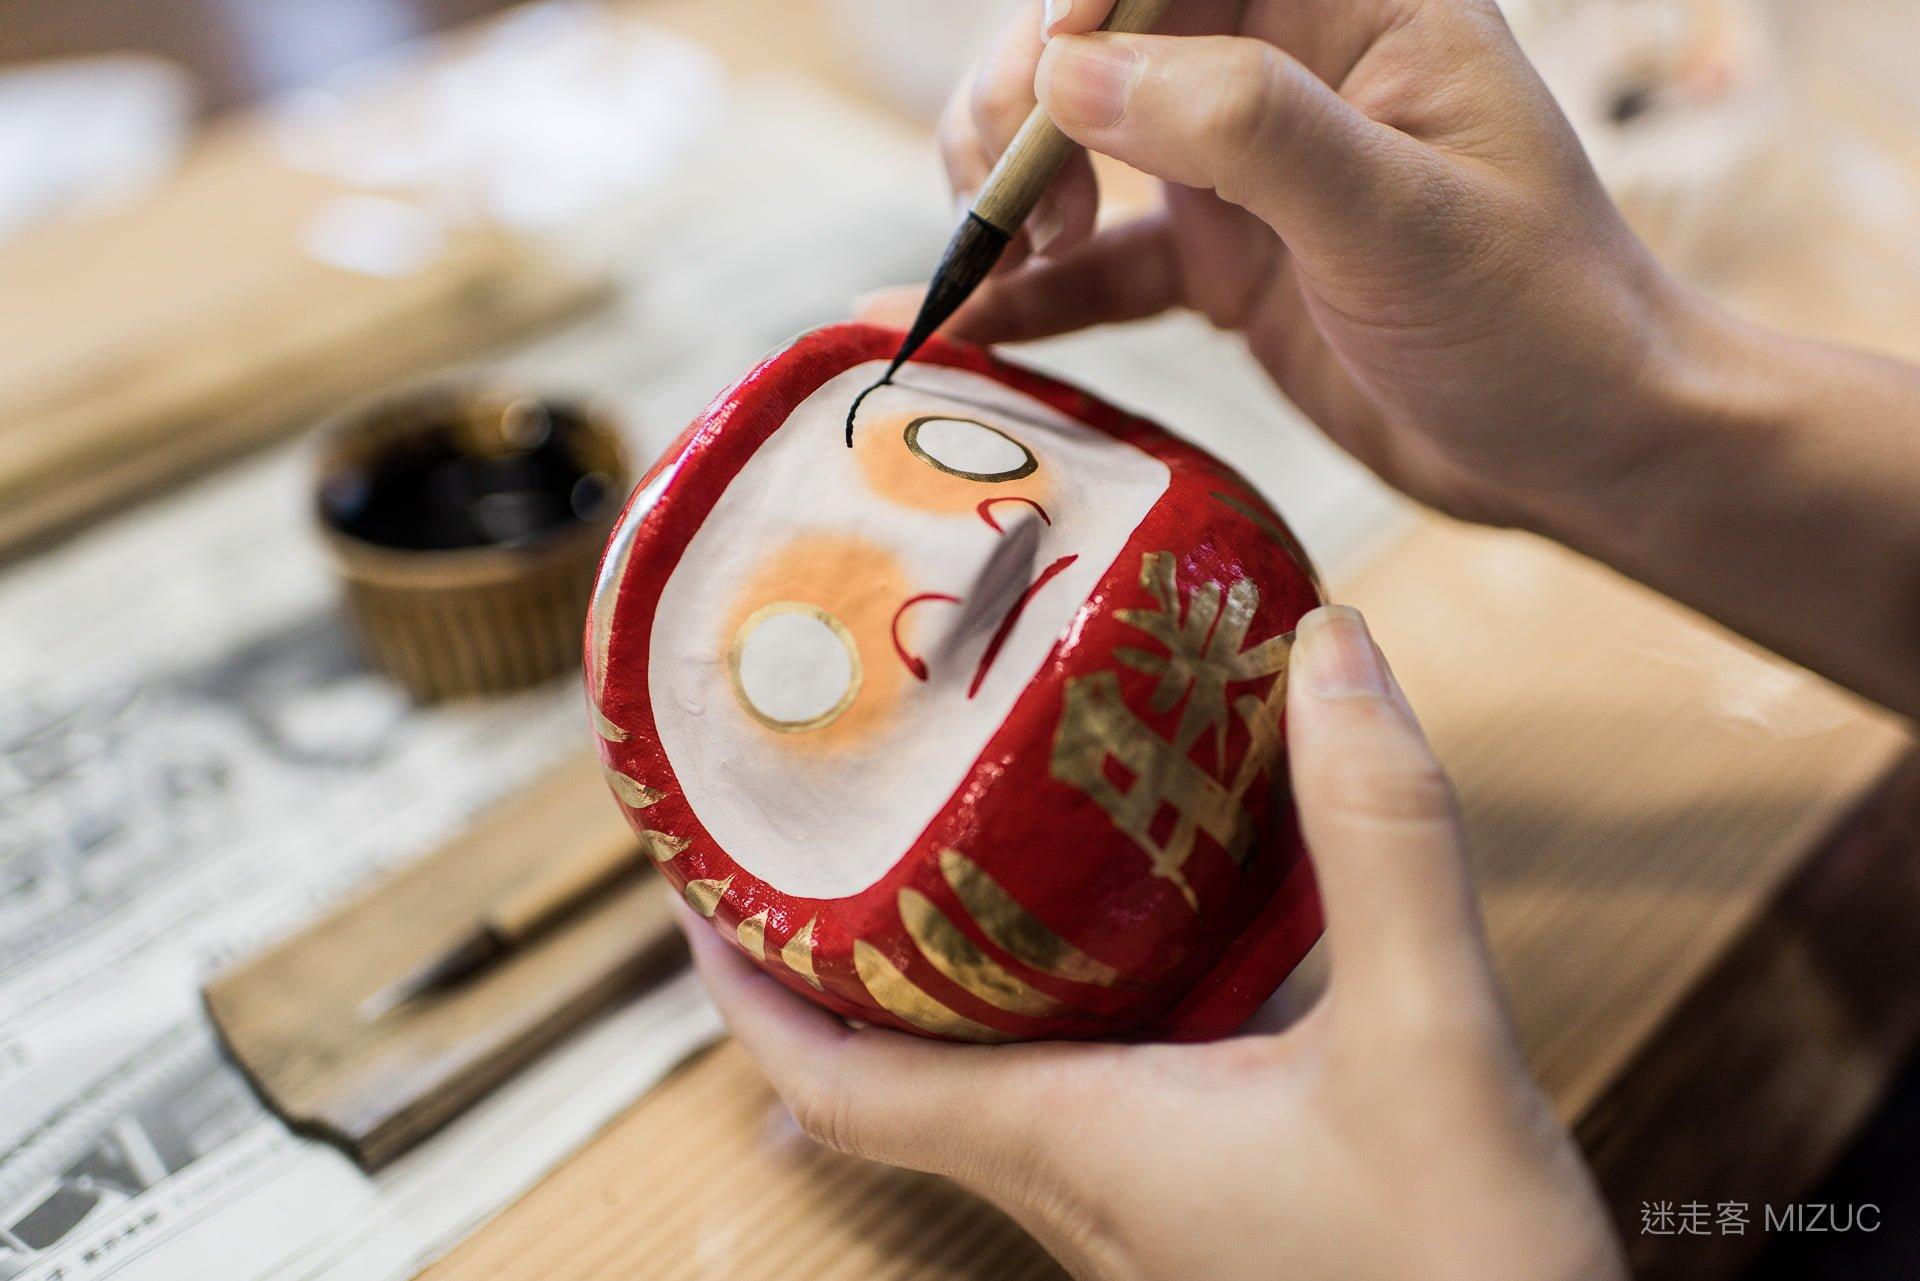 201711 Ibaraki Tochigi Gunma Japan Travel By RentalCar 80 日本自駕旅遊/北關東三縣「茨城、櫪木、群馬」秋天美食、溫泉與瀑布秘境百景(精選照片分享)